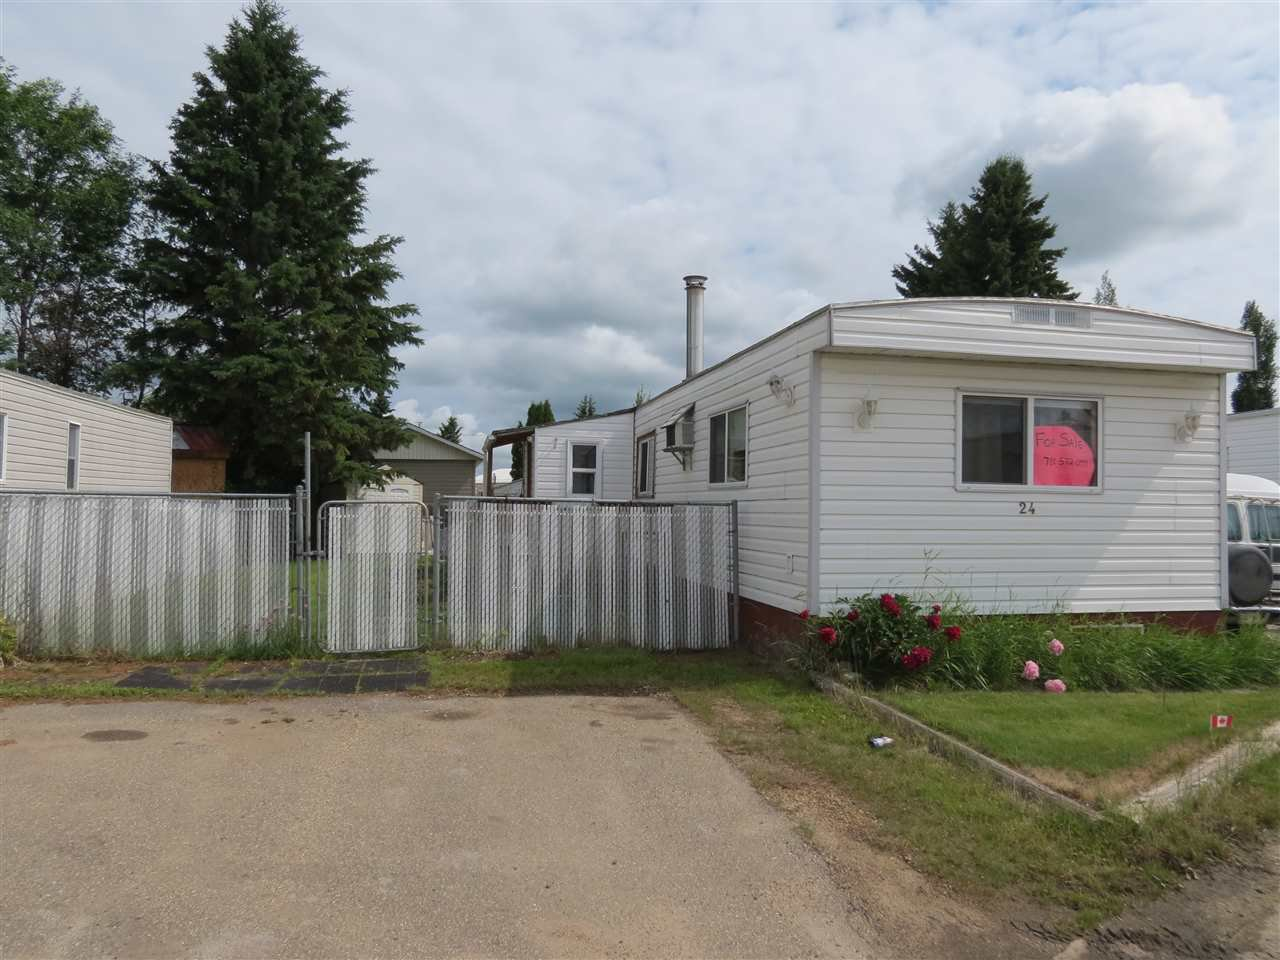 Main Photo: 24 10420 101A Street: Morinville Mobile for sale : MLS®# E4164192